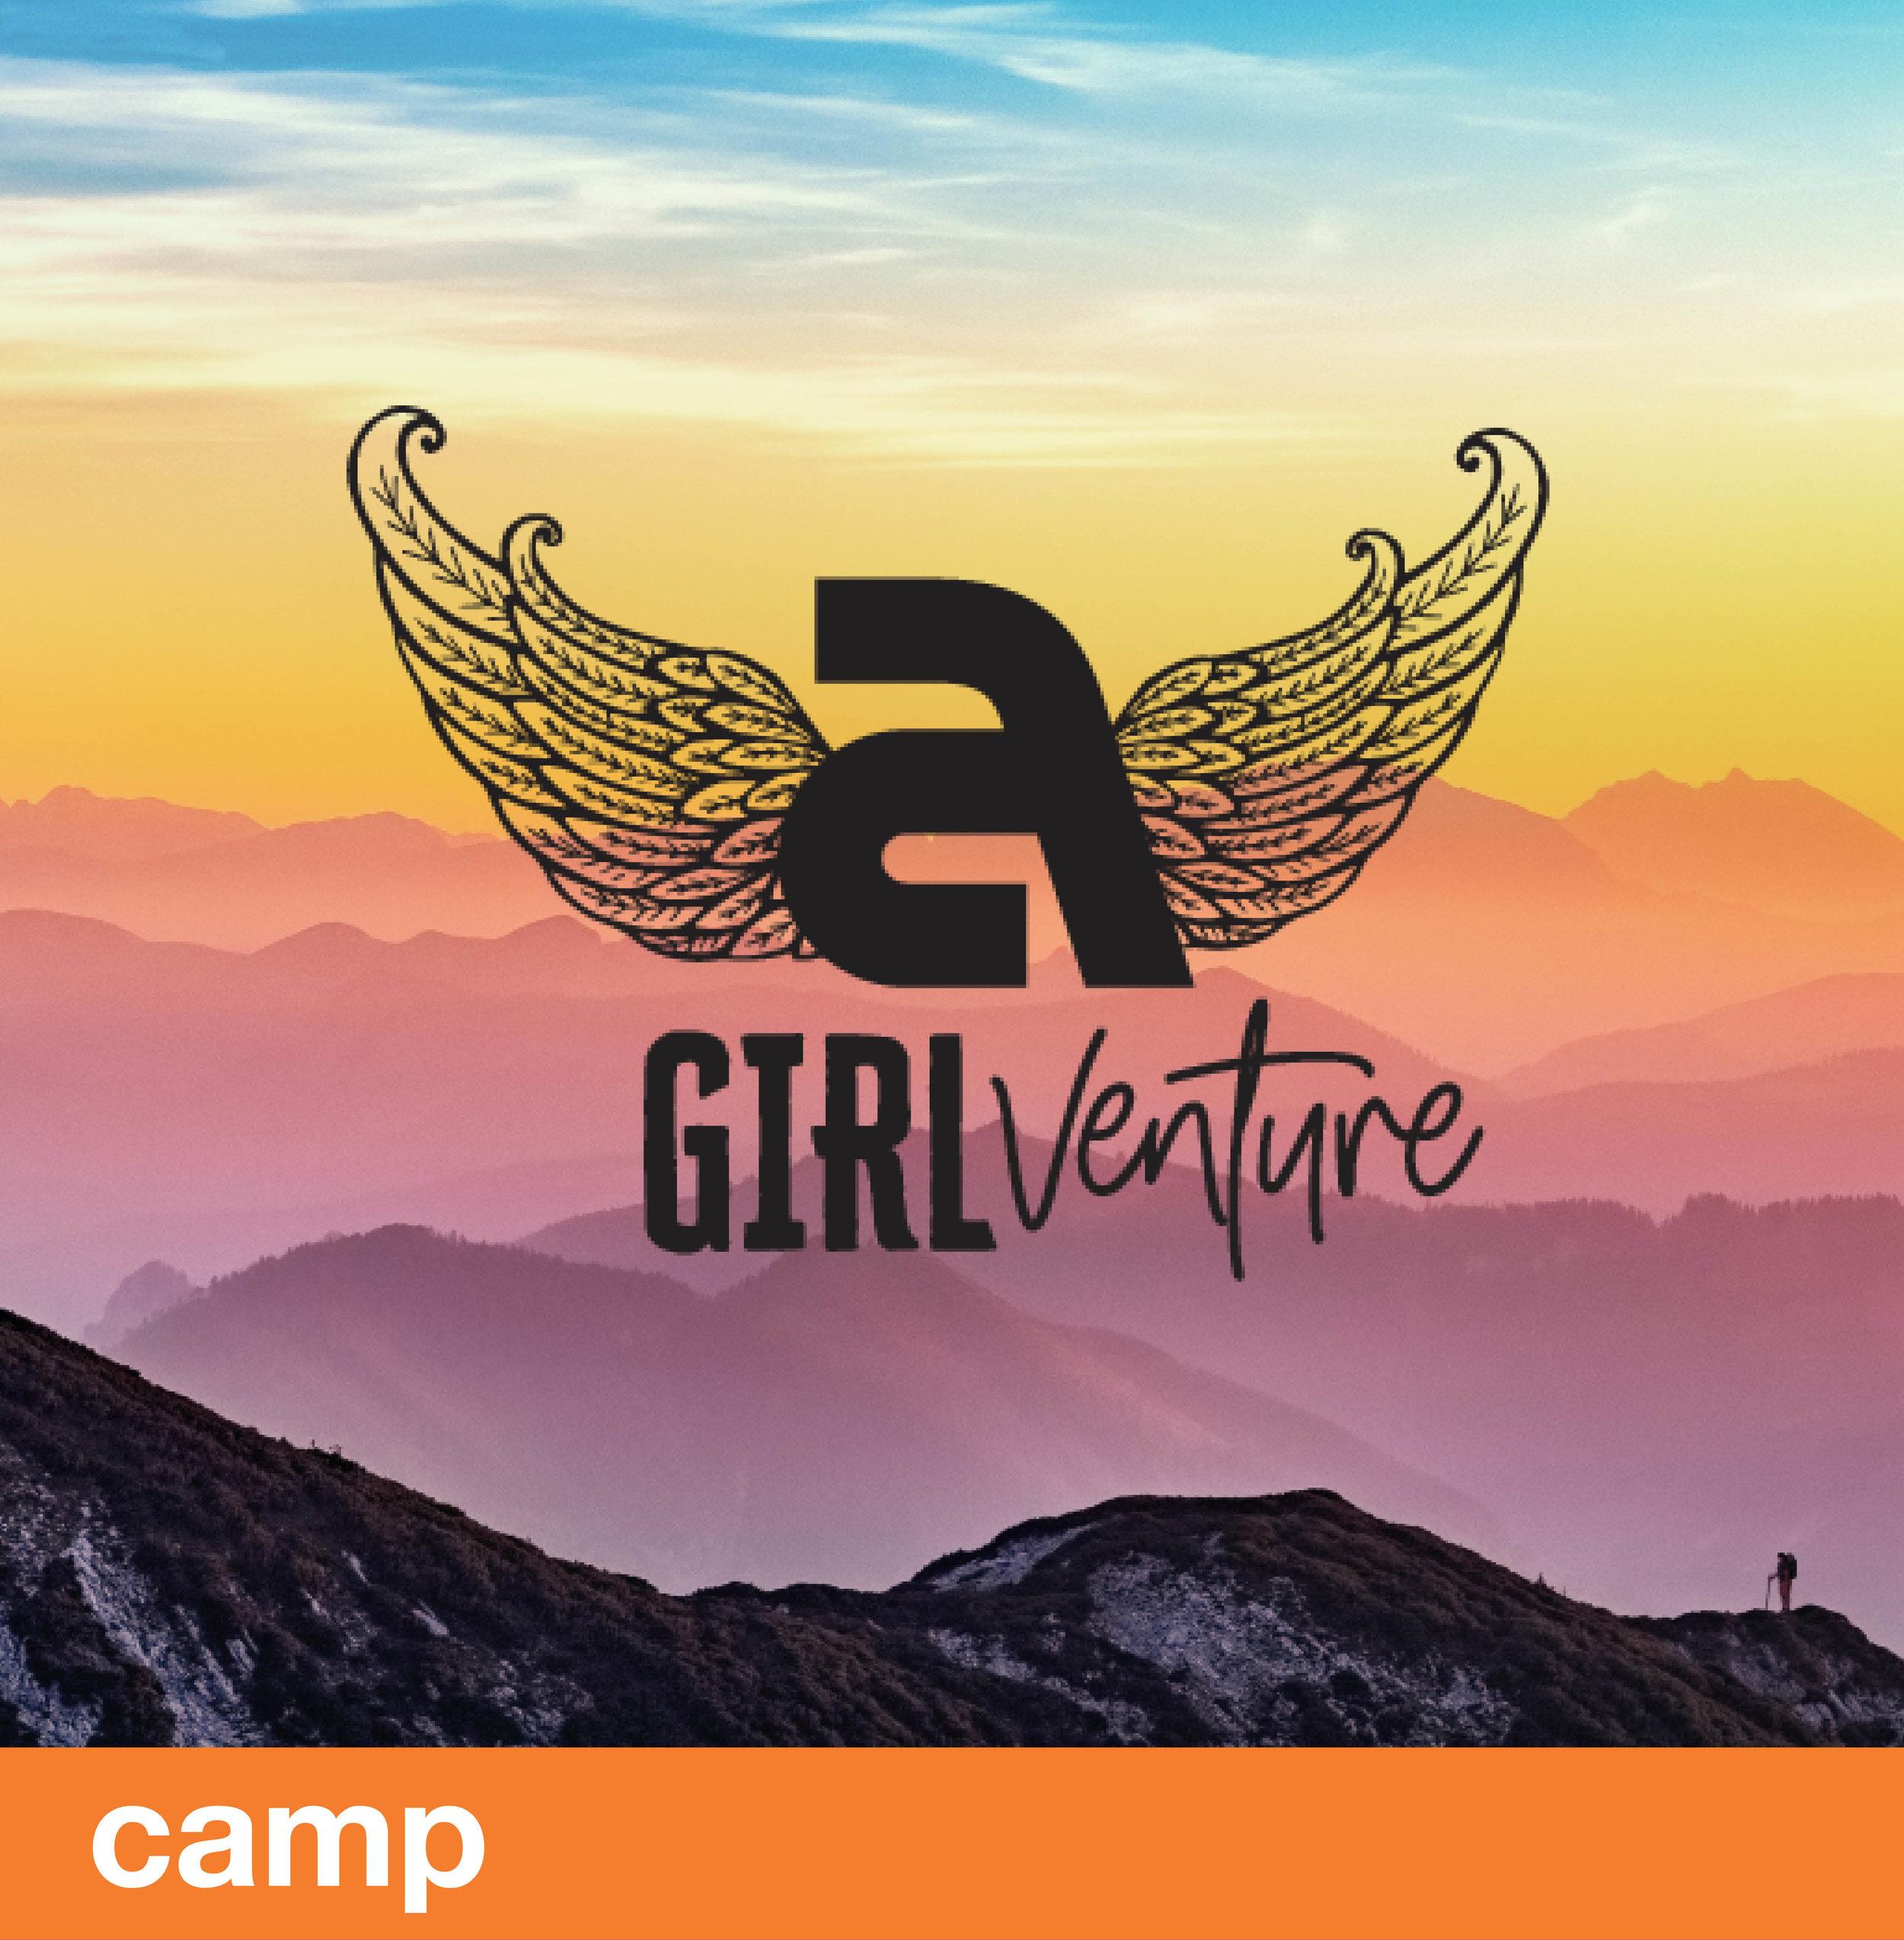 camp Girlventure.jpg